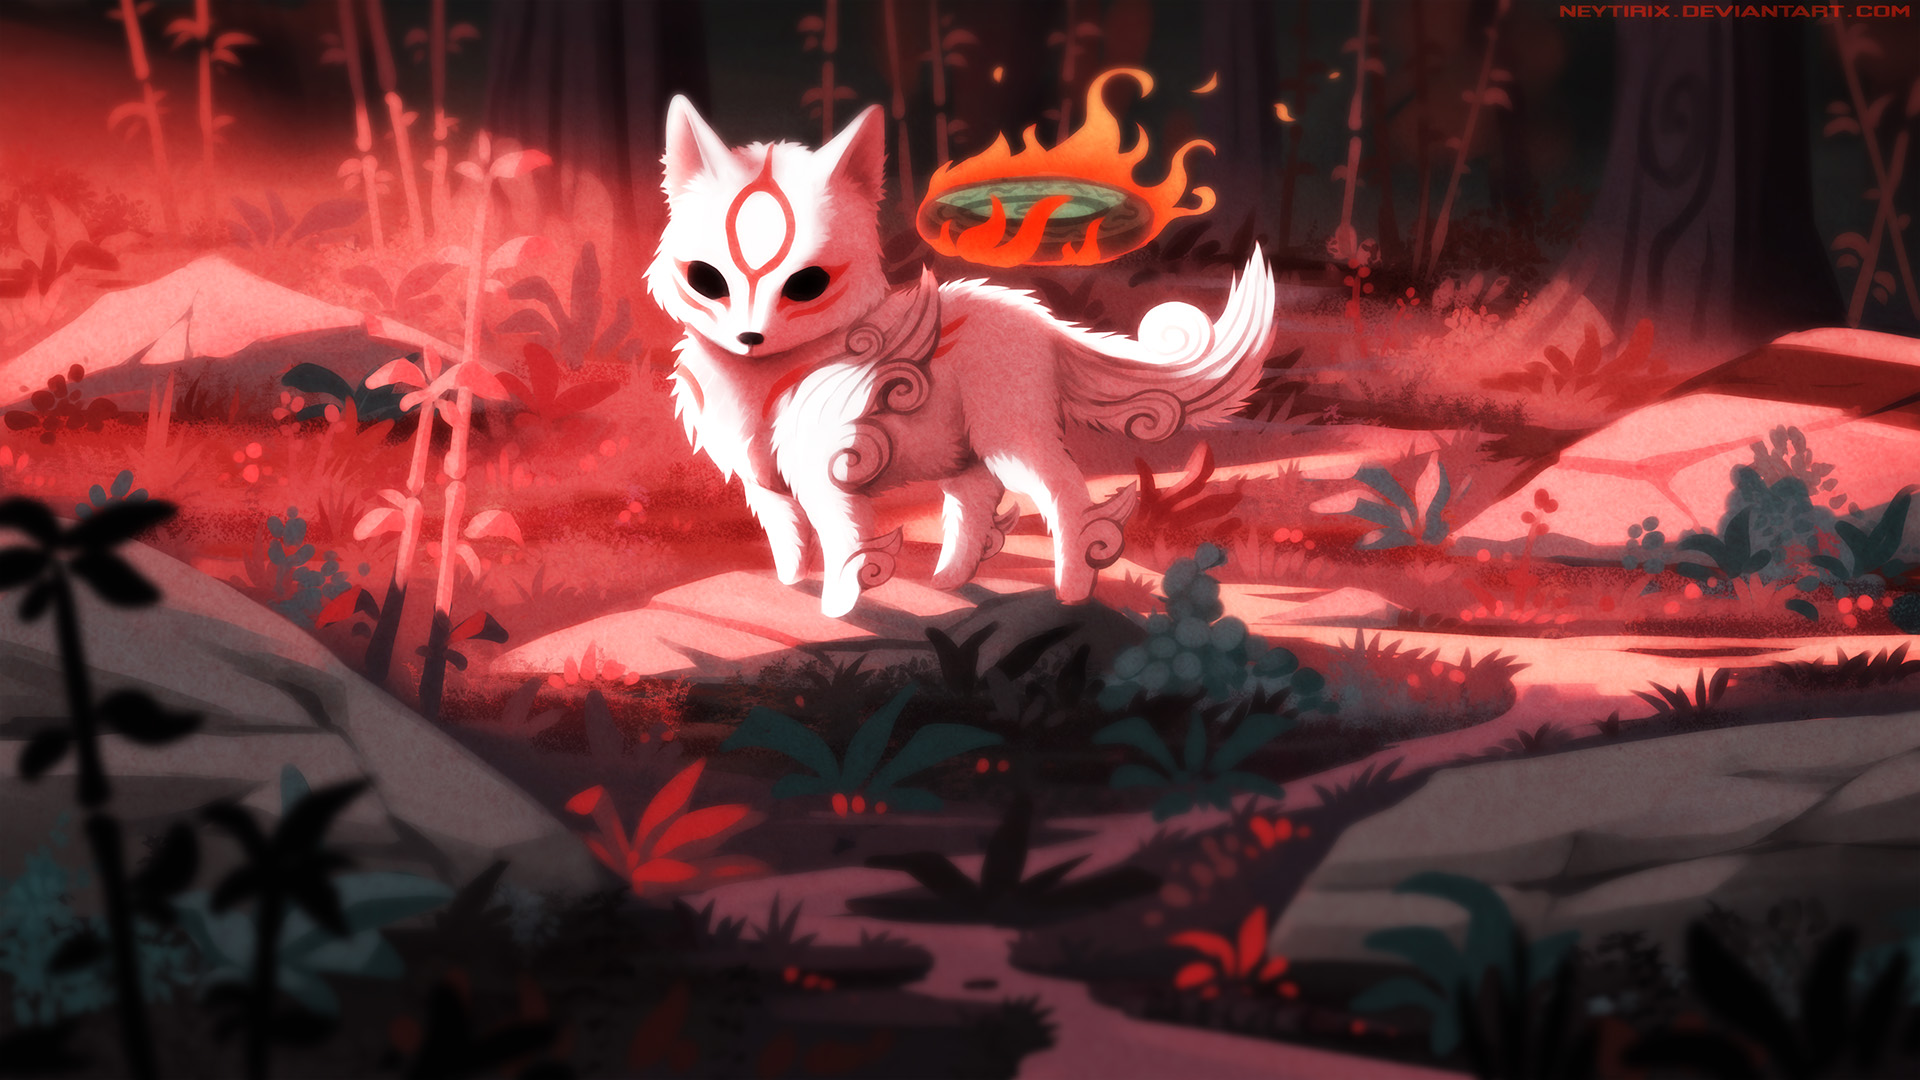 Animal Fox Okami HD Artist 4k Wallpapers Images Backgrounds